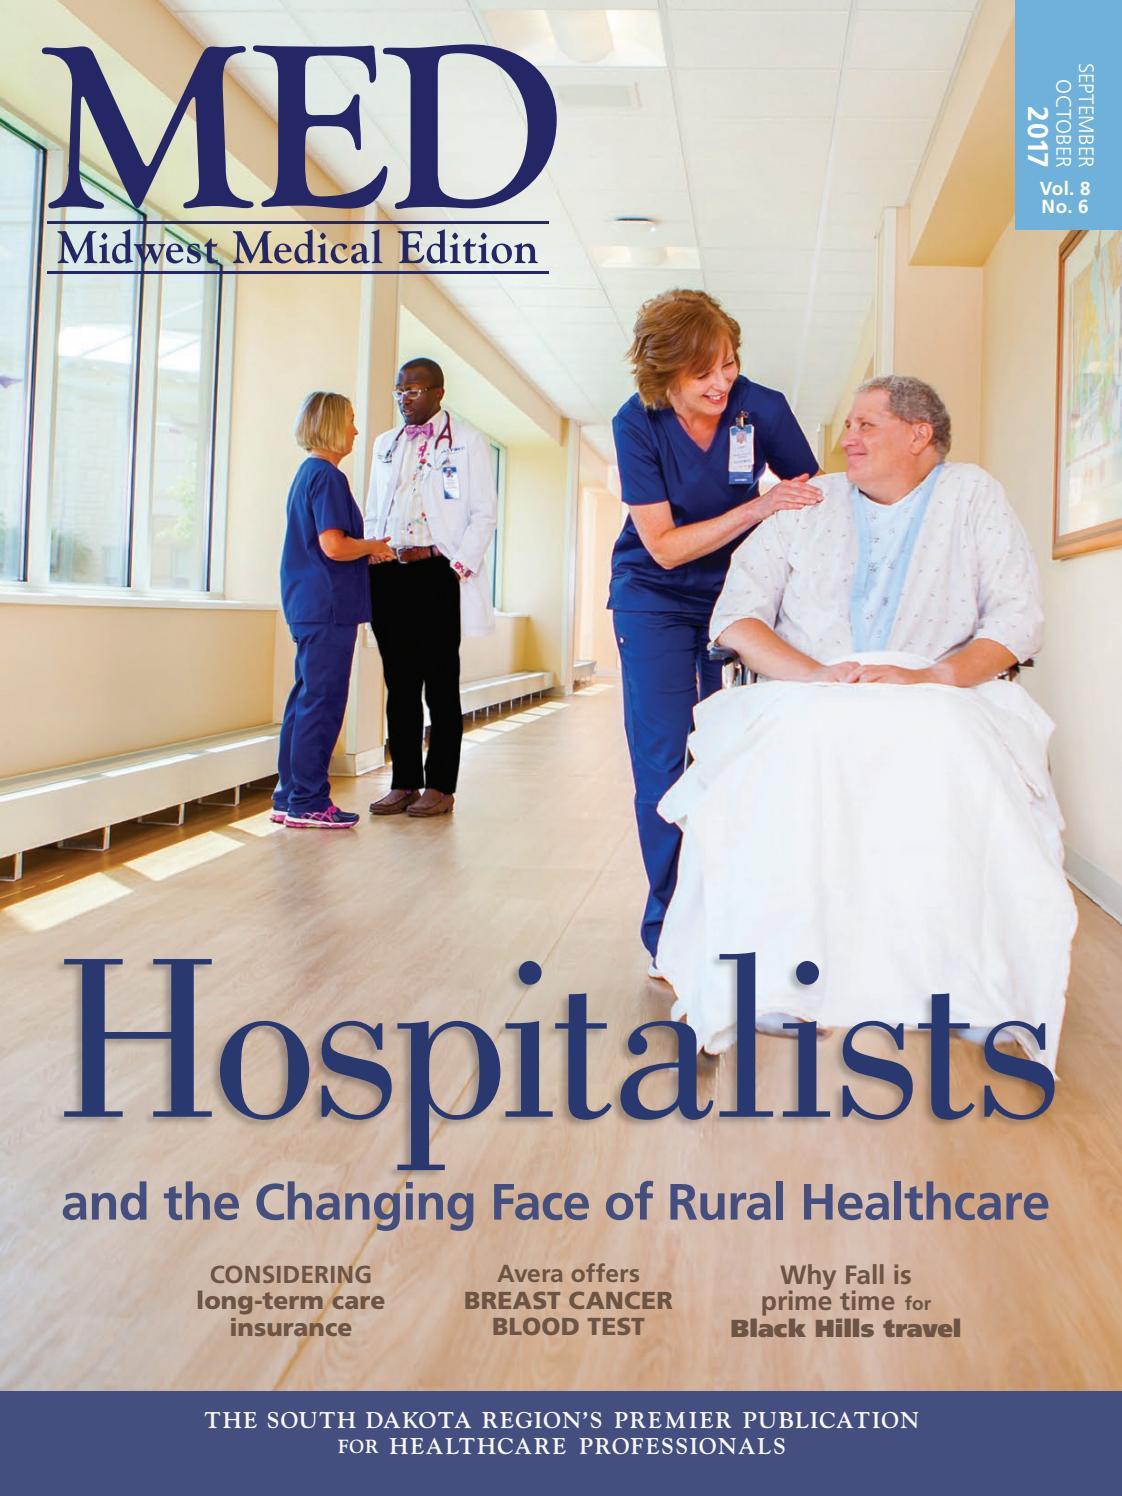 Med September October 2017 By Med Midwest Medical Edition Issuu